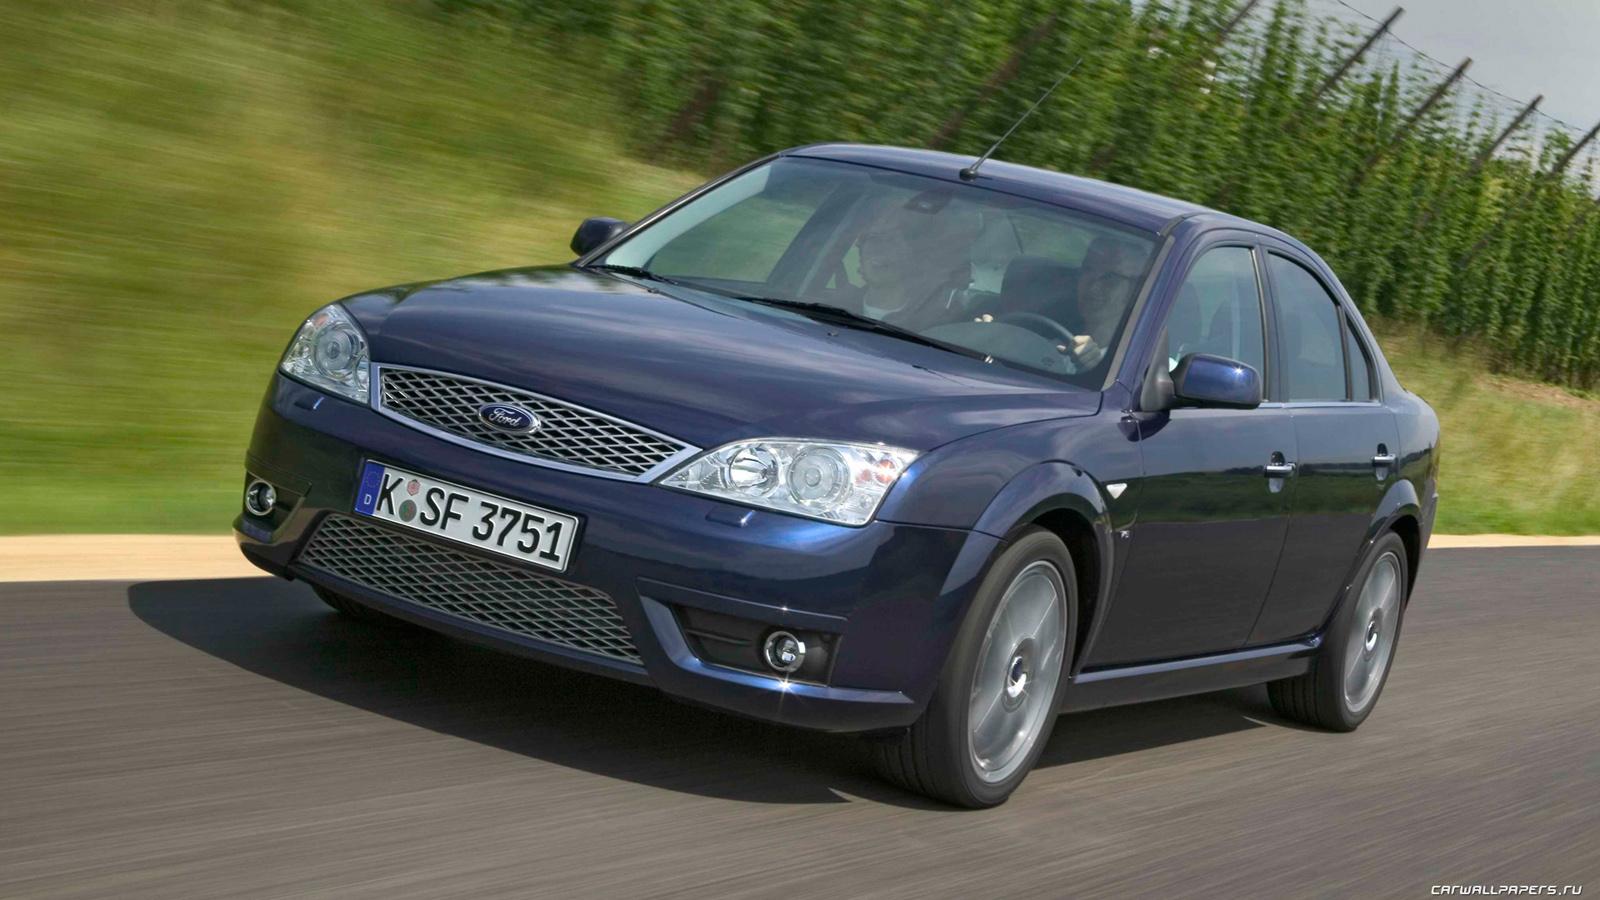 Чехлы на Ford Mondeo 4 c 2007г. (Titanium) - avtobm.ru